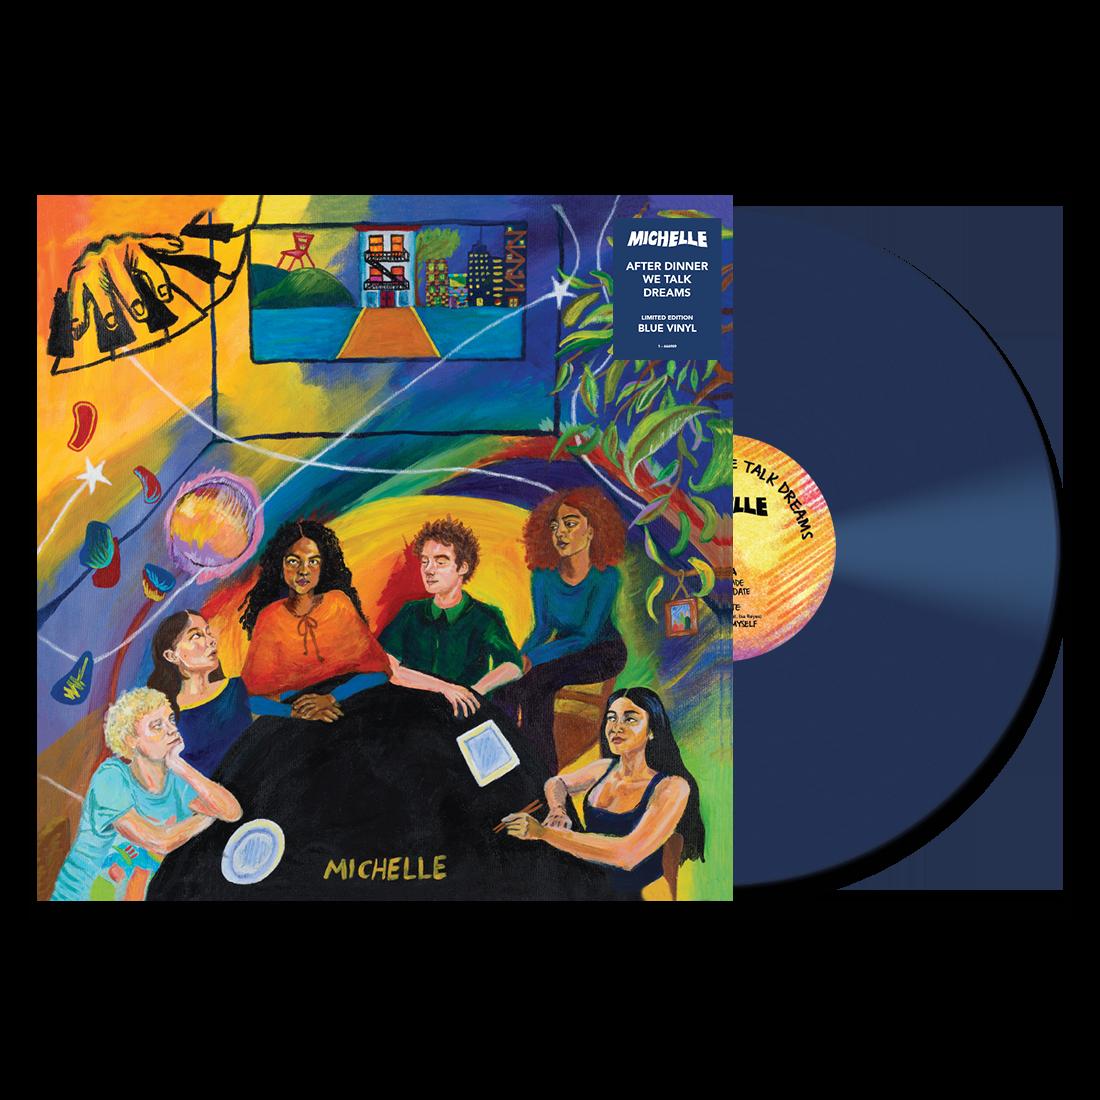 Transgressive Records Michelle - After Dinner We Talk Dreams (Coloured Vinyl)